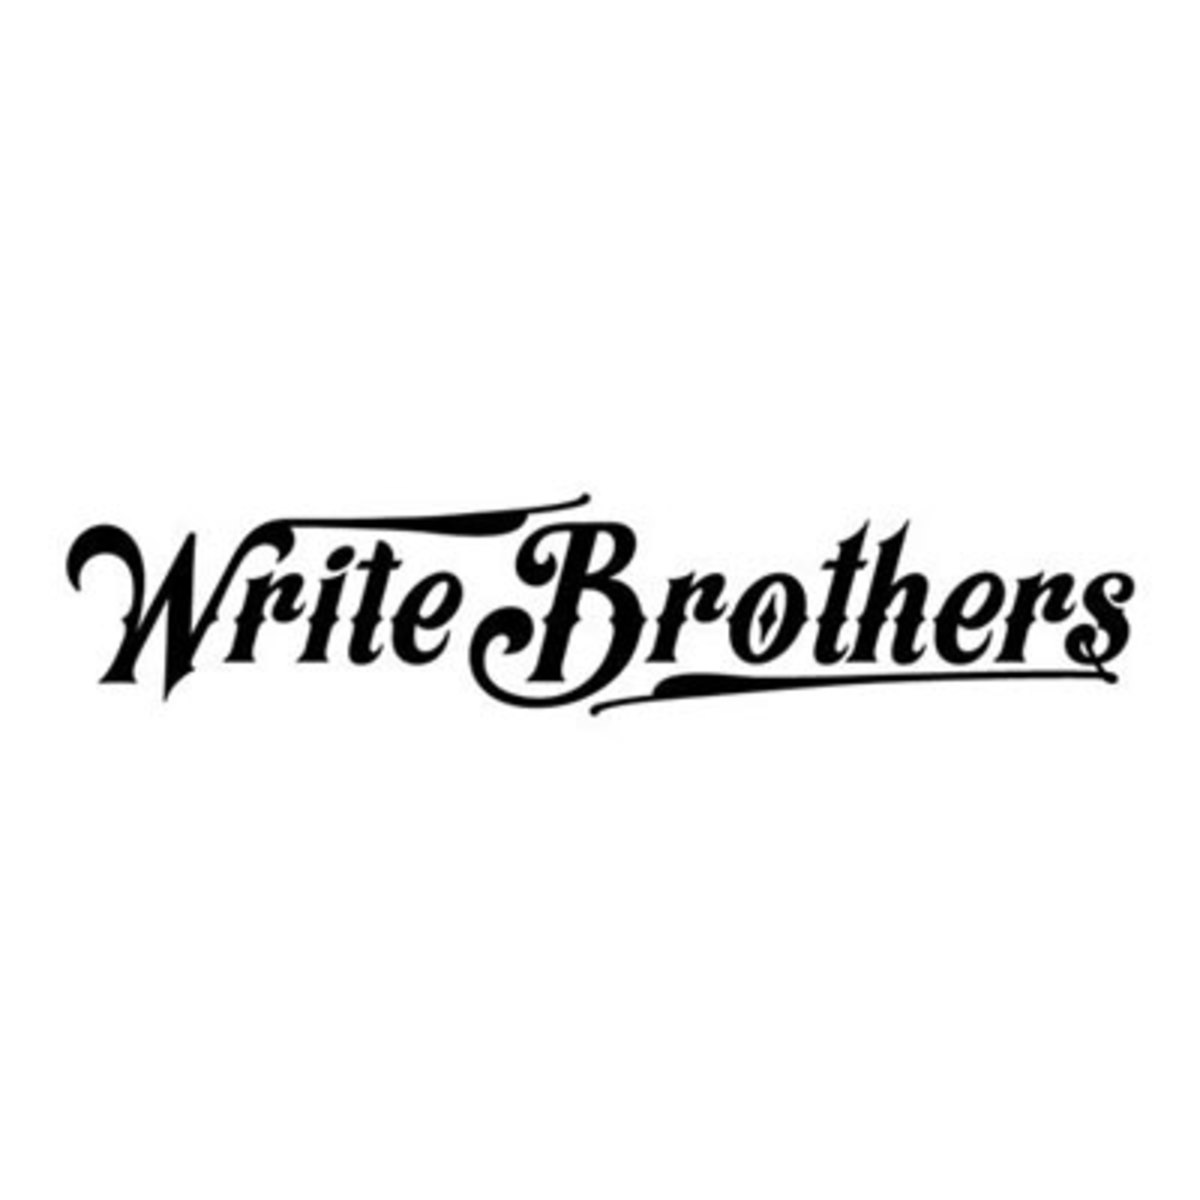 writebrothers.jpg